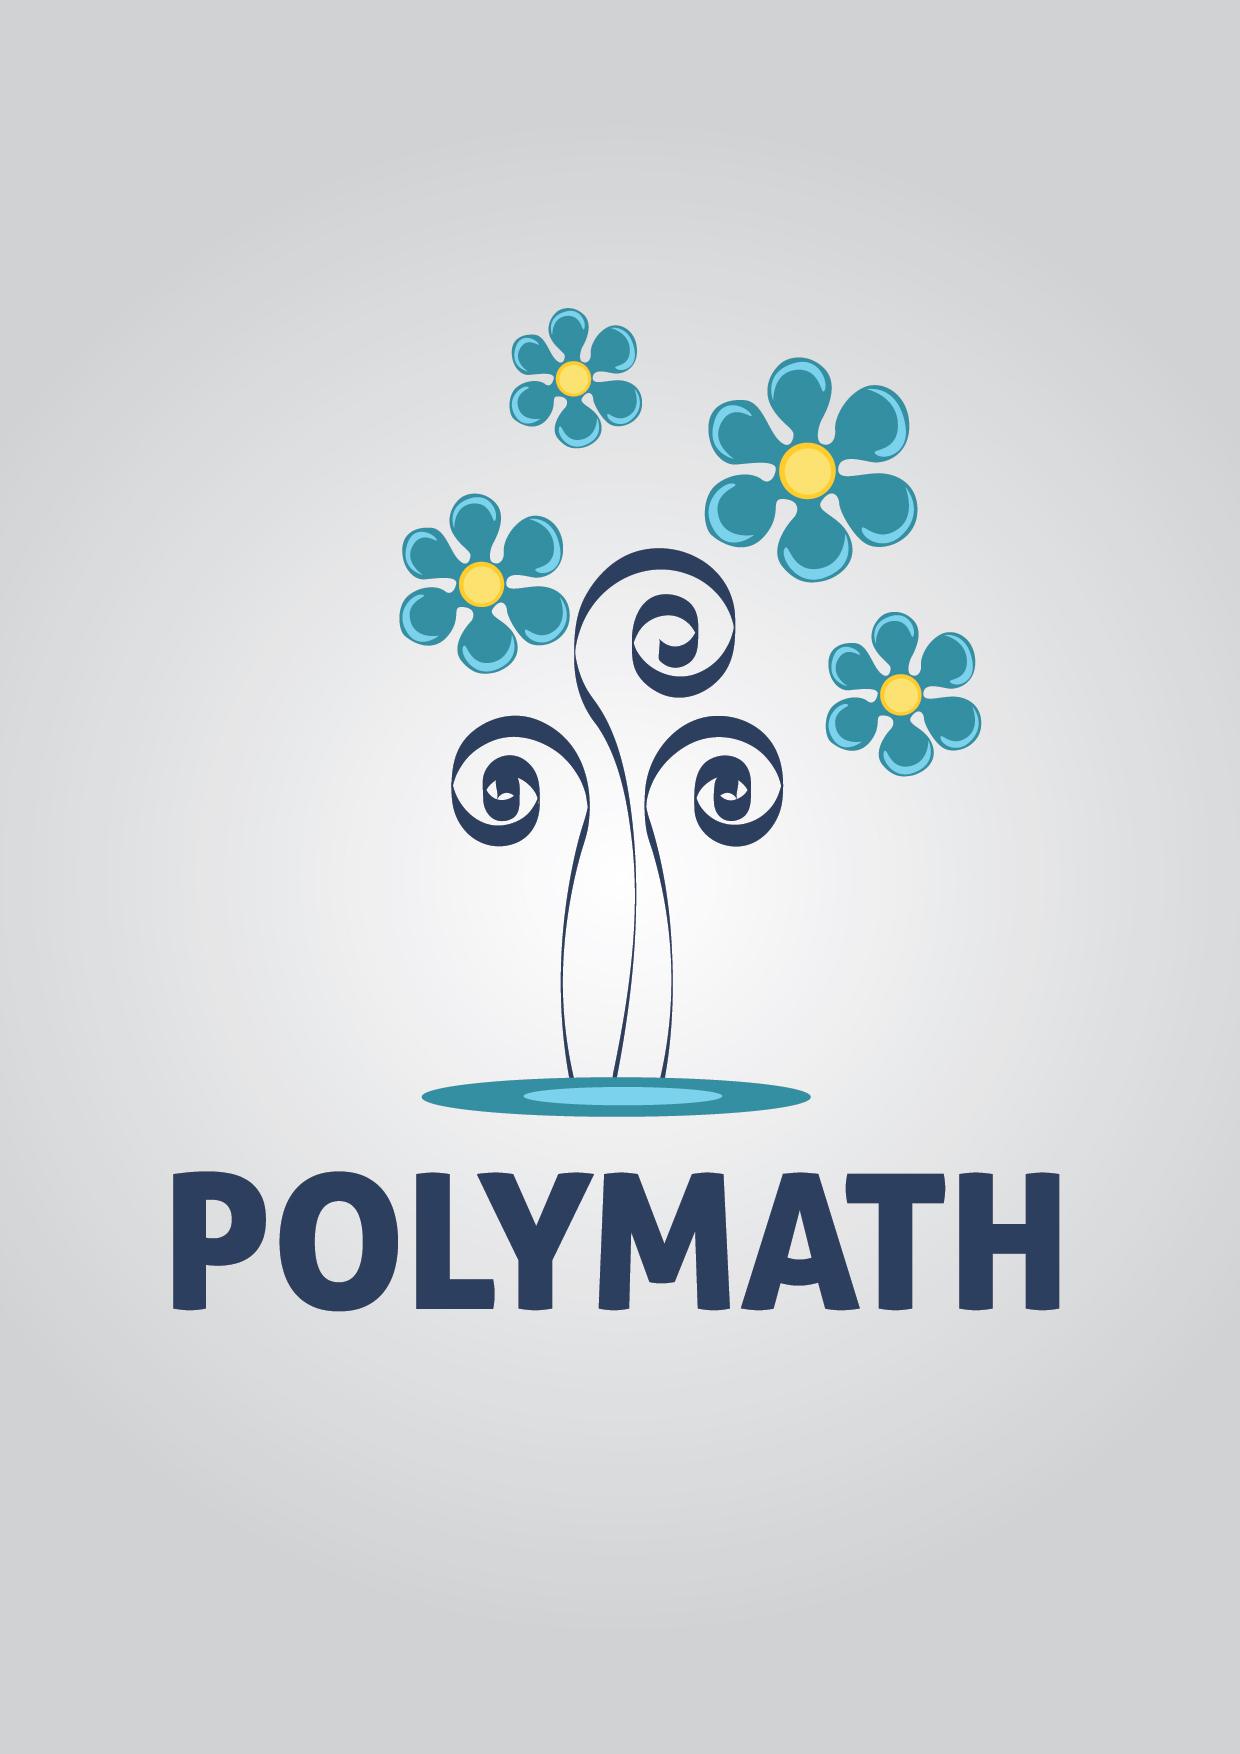 Logo Design by mediaproductionart - Entry No. 9 in the Logo Design Contest Imaginative Logo Design for Polymath.